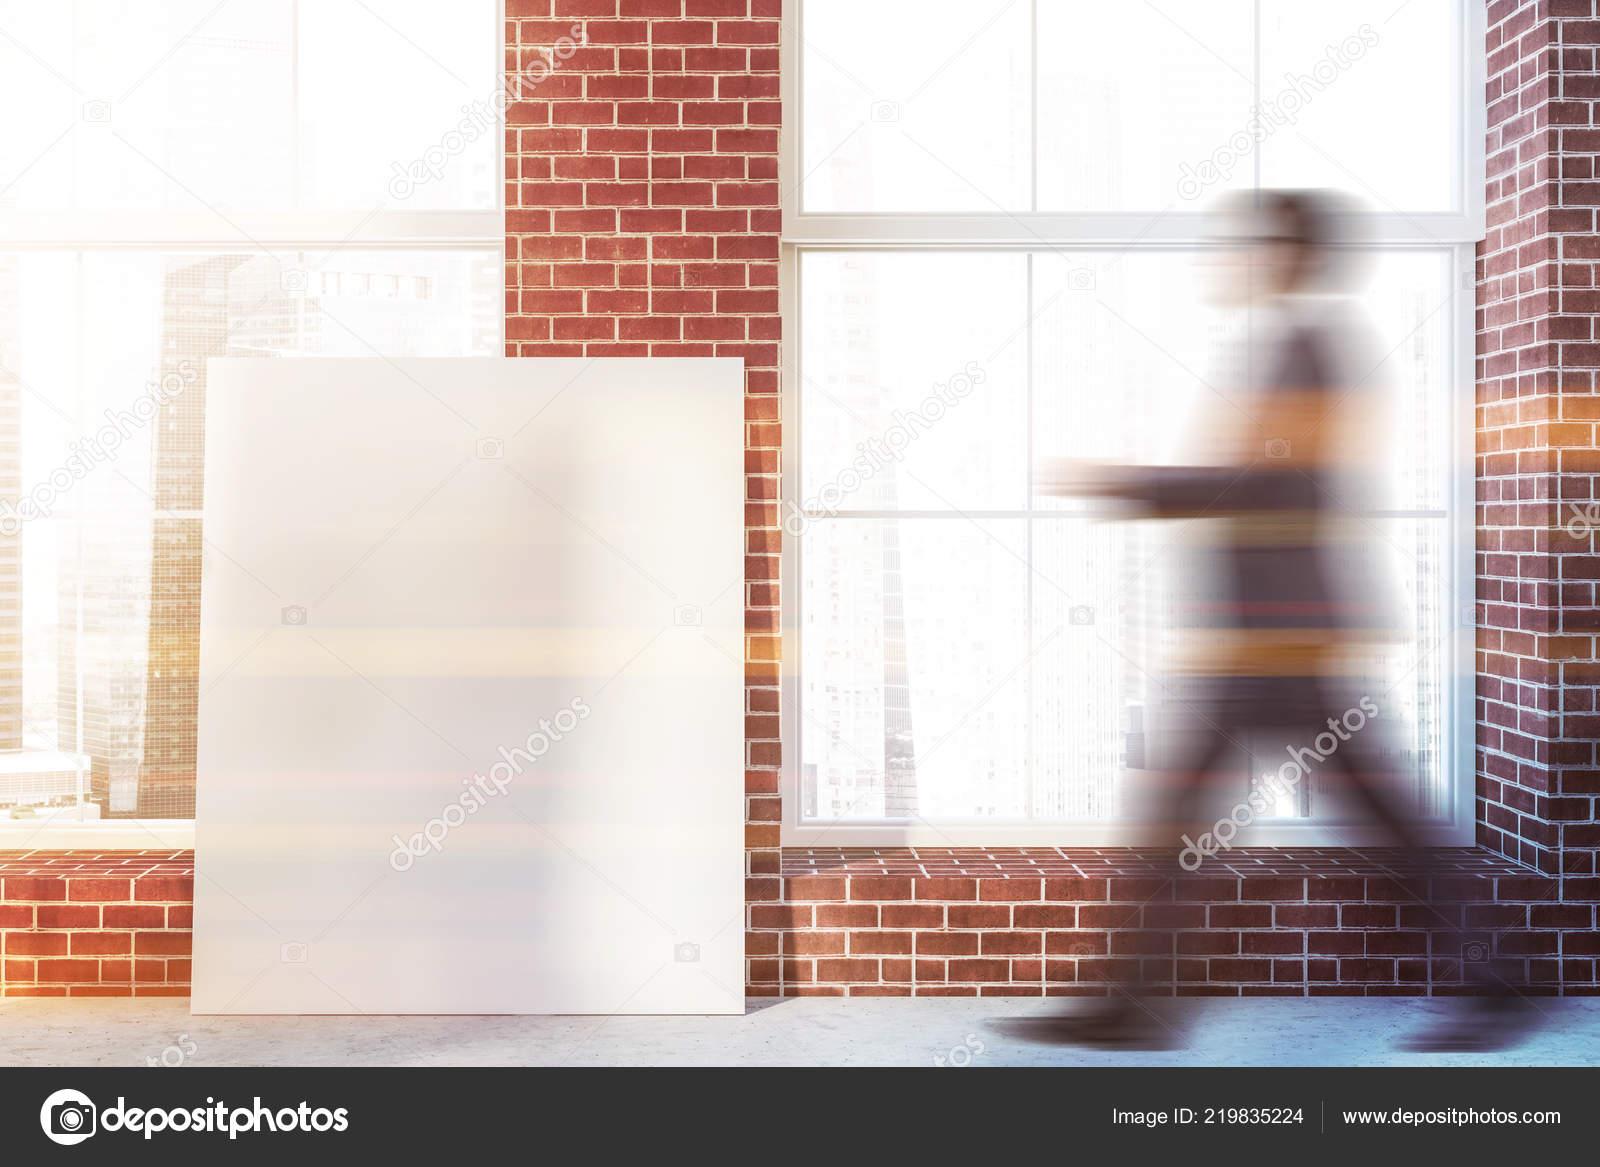 Man Walking Empty Room Brick Walls Concrete Floor Big Windows Stock Photo C Denisismagilov 219835224